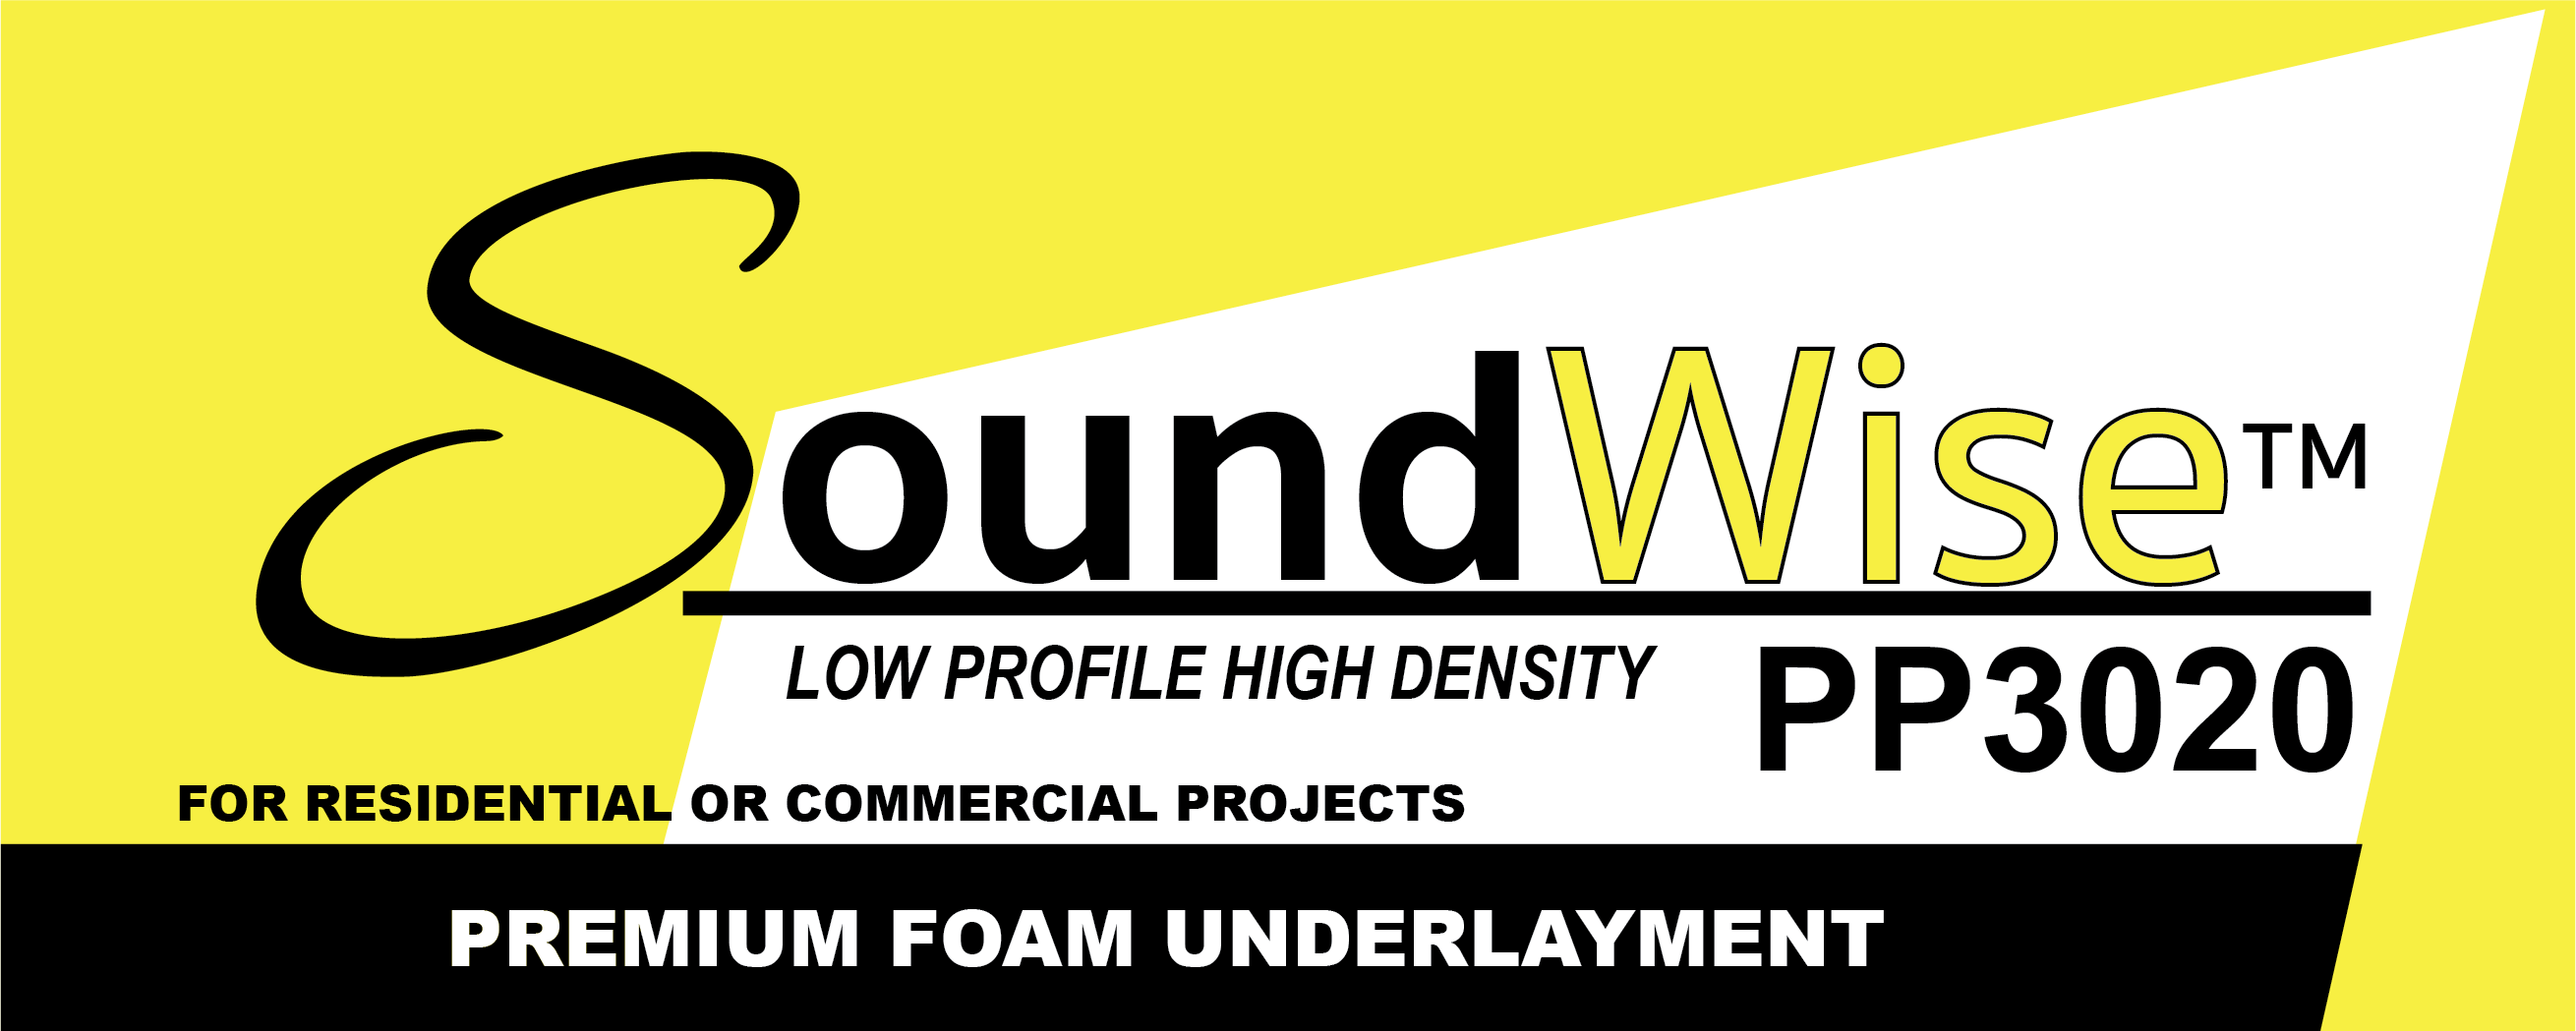 Soundwise™ PP3020 Low Profile High Density Premium Foam Underlayment